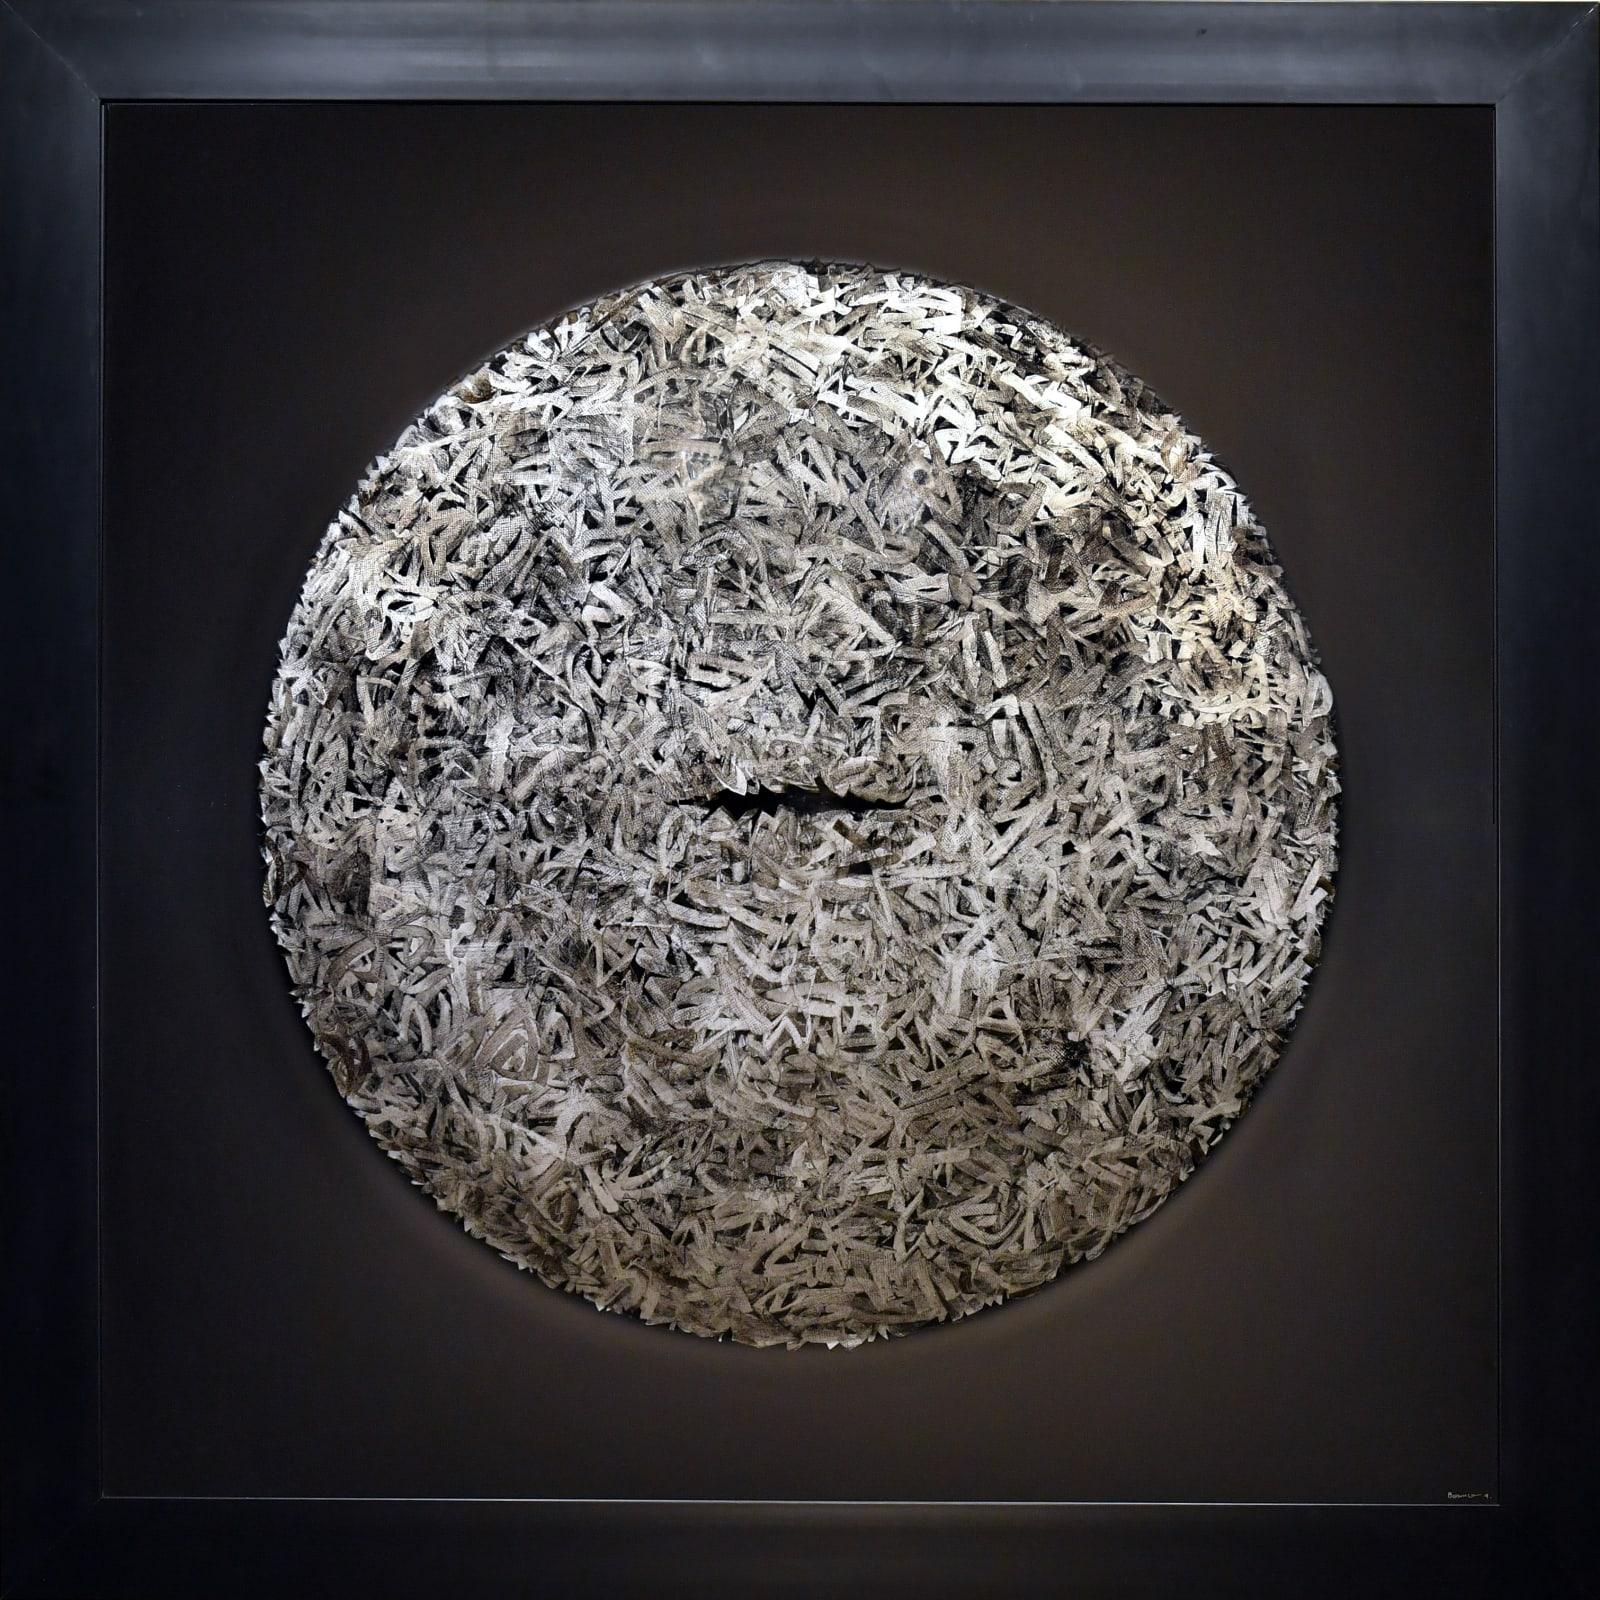 Hamza Bounoua, Exite 02, 2018, Mixed media on circular plexiglas, 145x145cm